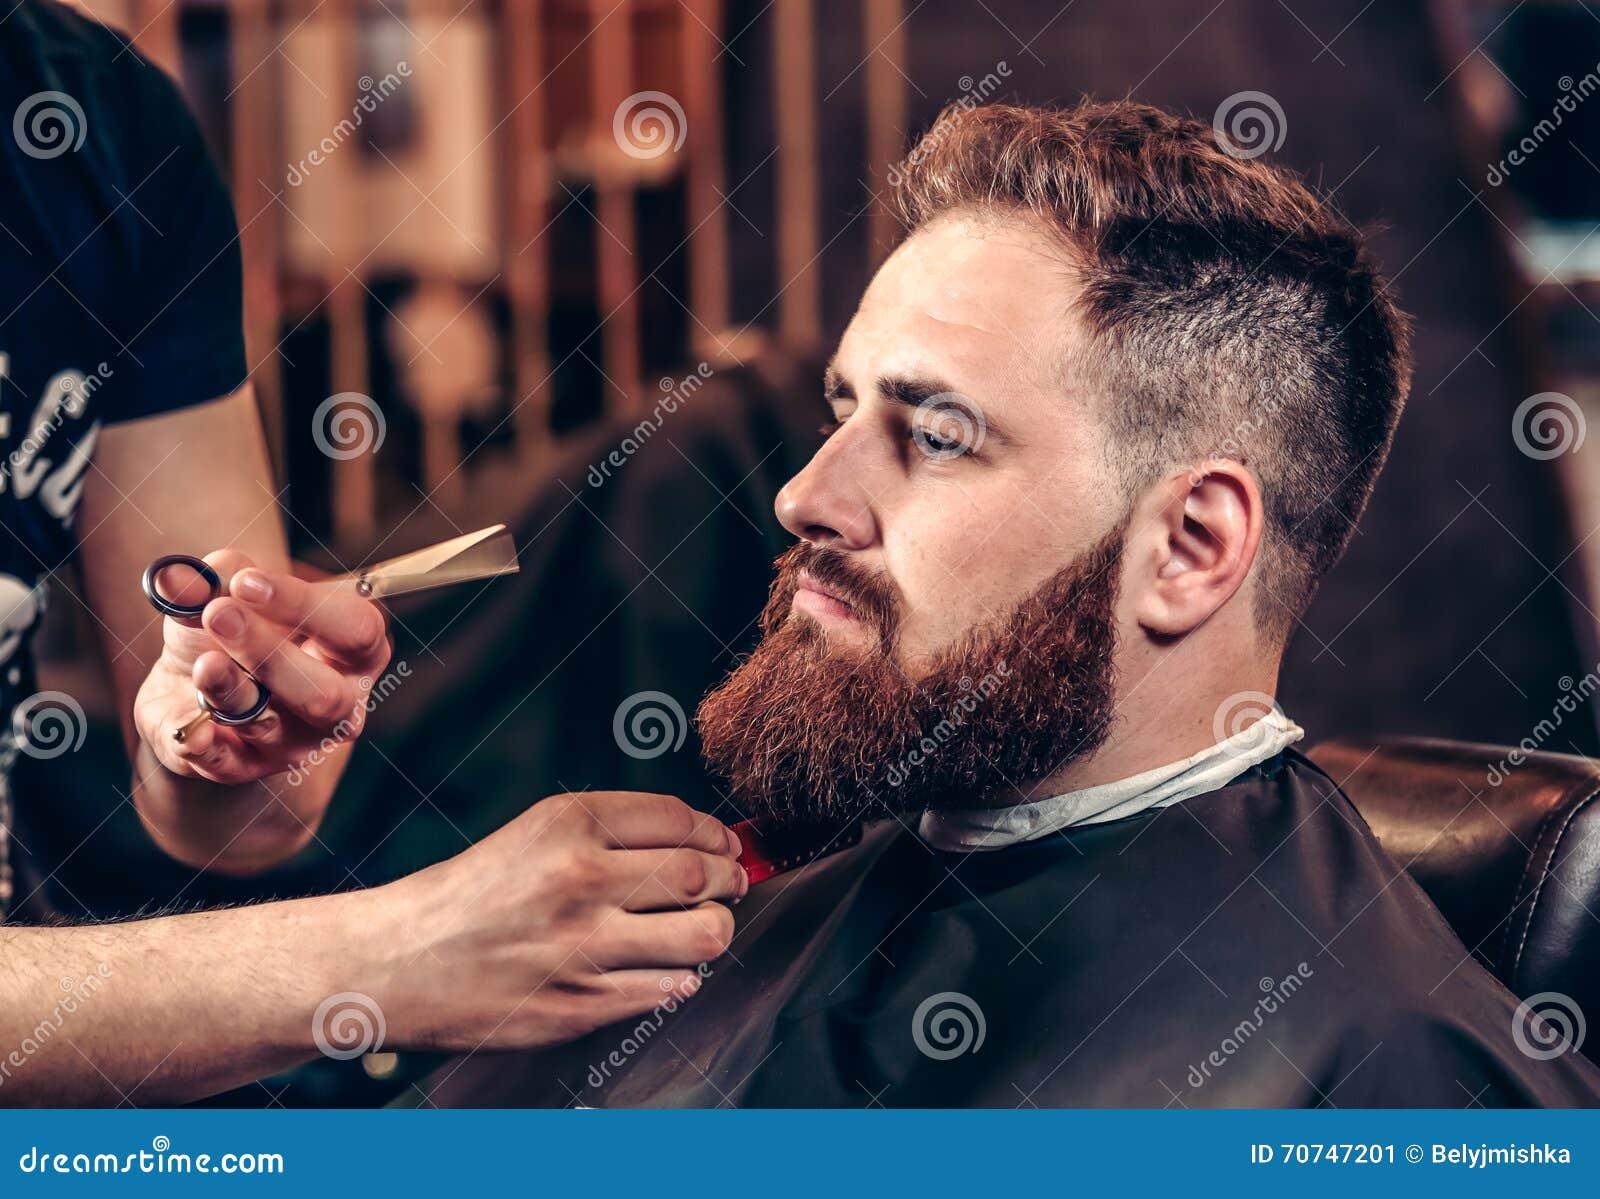 Closeup professional grooming beard with scissors